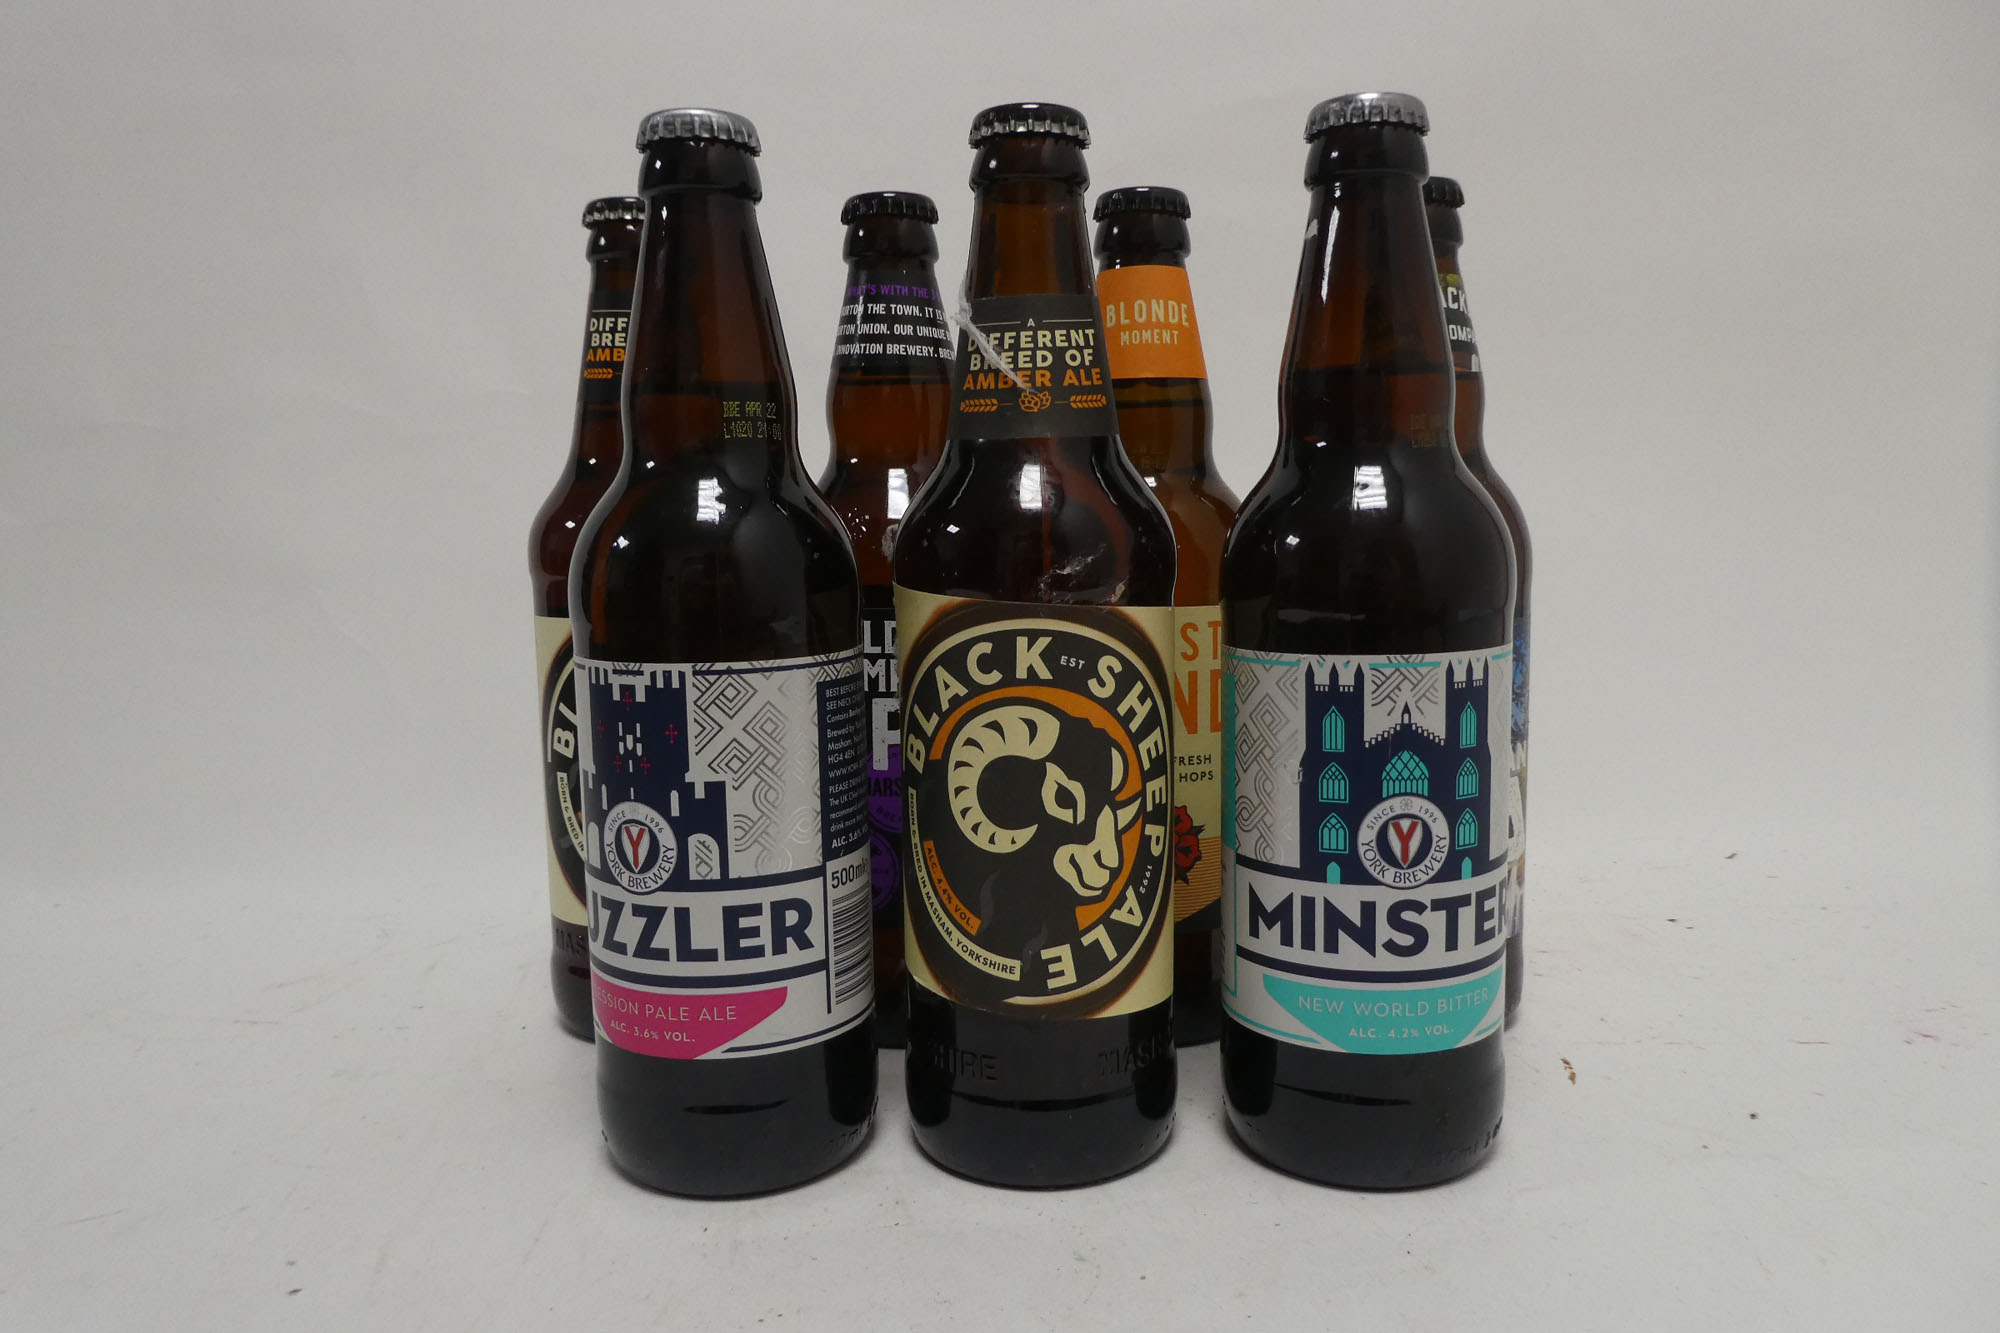 36 bottles of Ales including Black Sheep, Sadler's Peaky Blinder Black IPA,